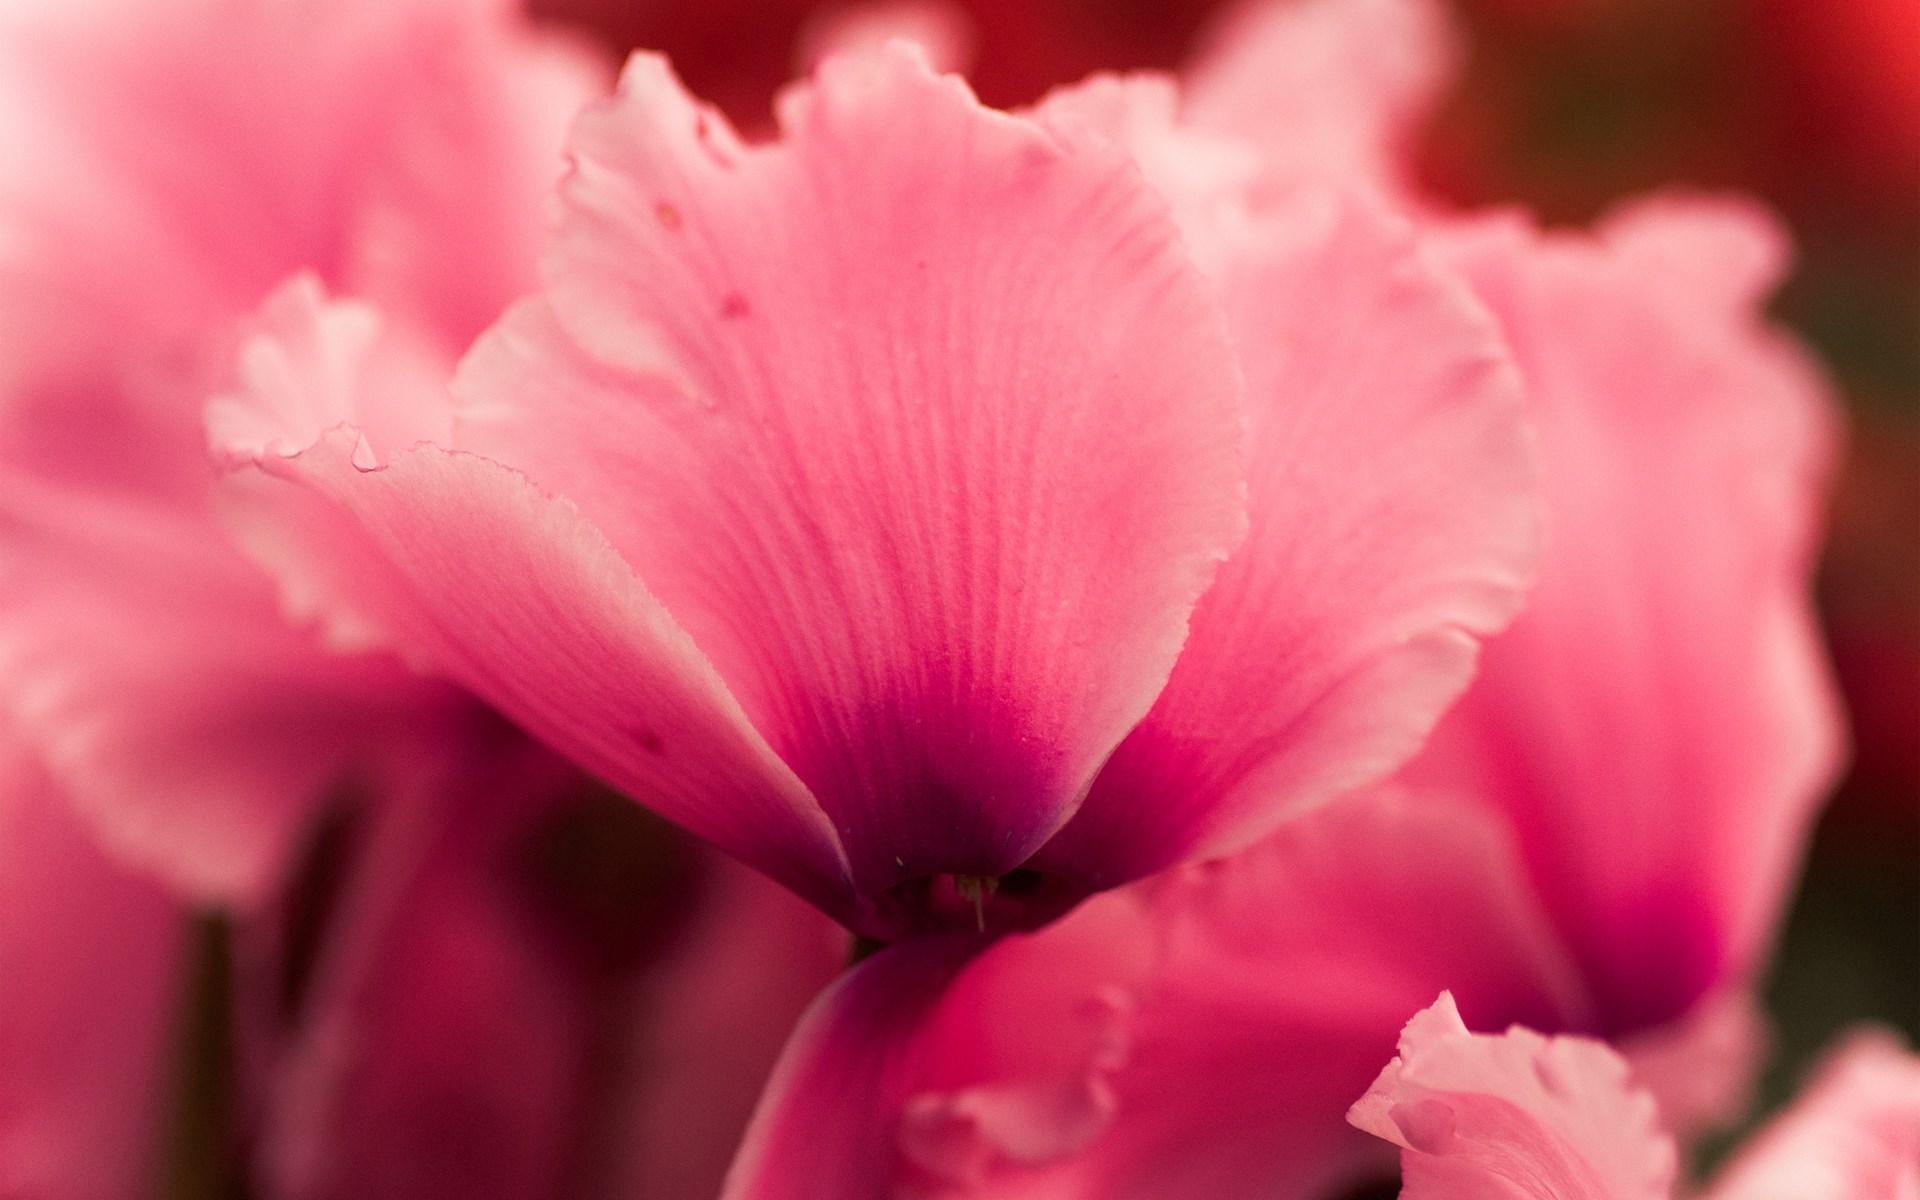 flower petals 25869